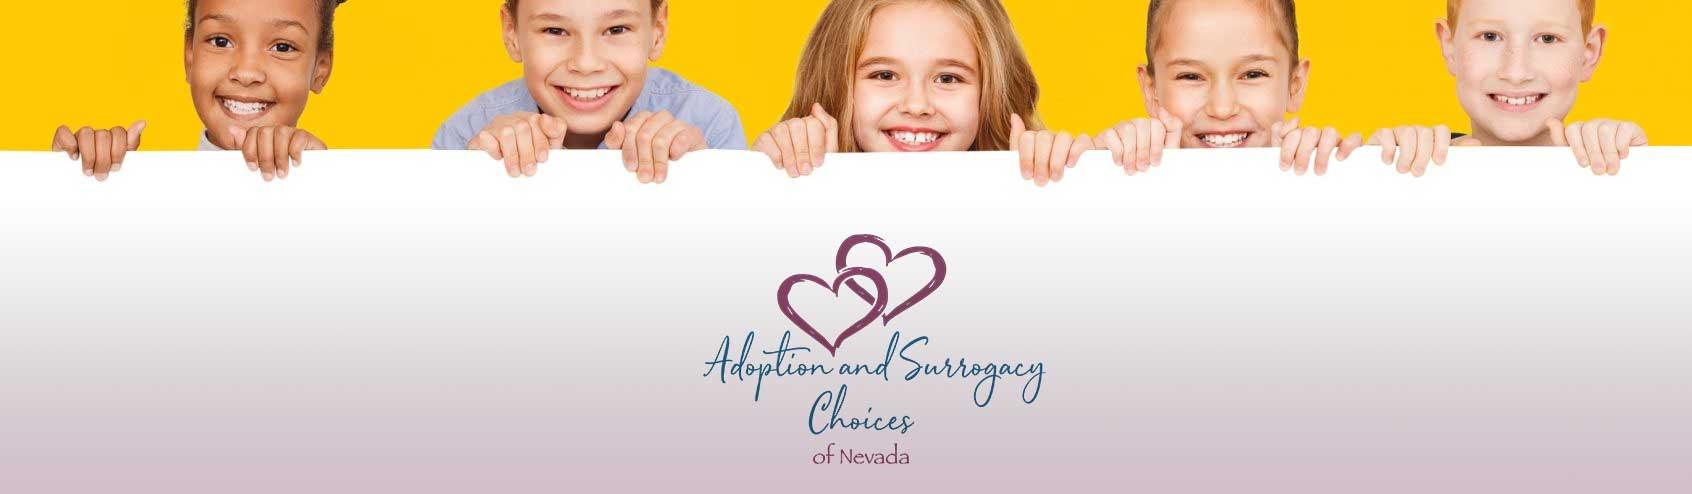 types-of-adoption-banner